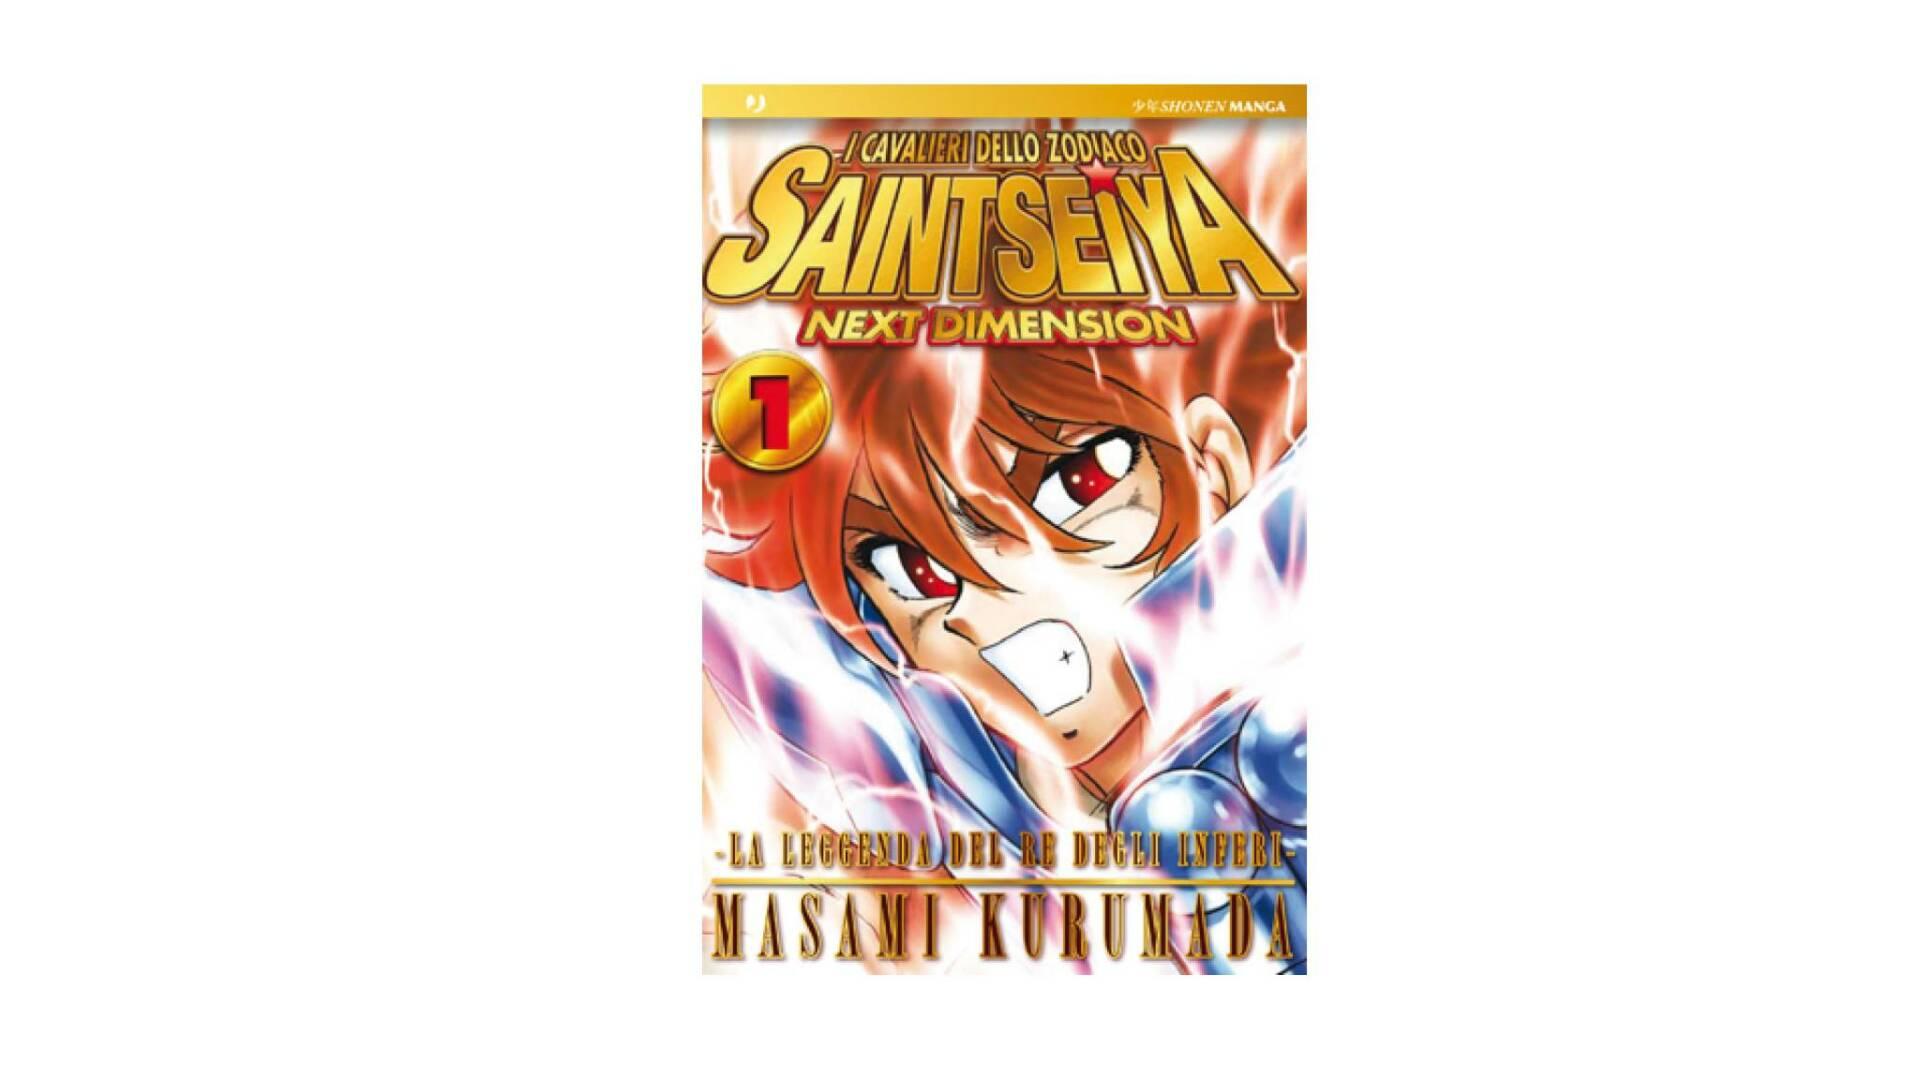 Saint Seiya - Next Dimension